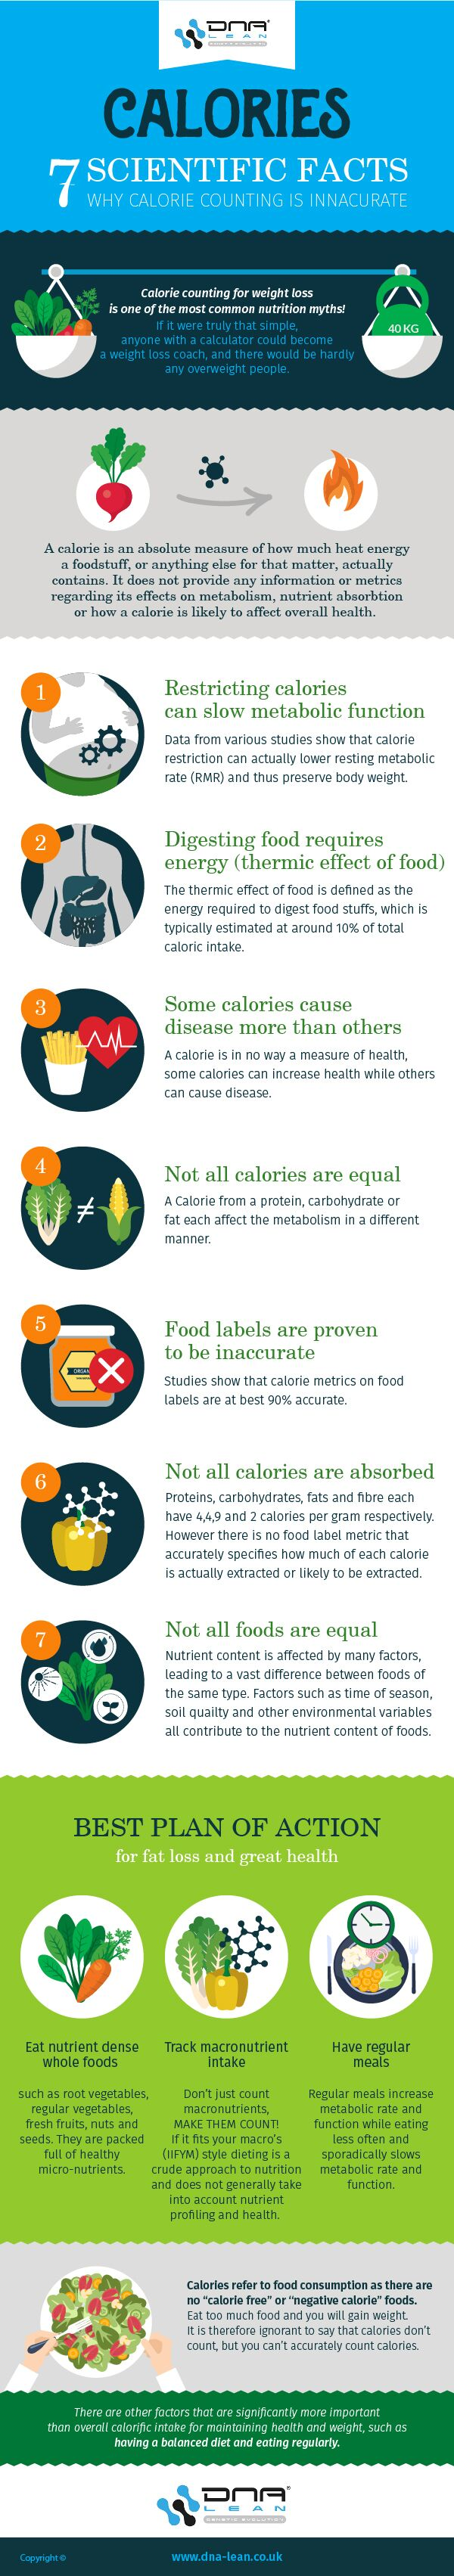 Calorie infographic